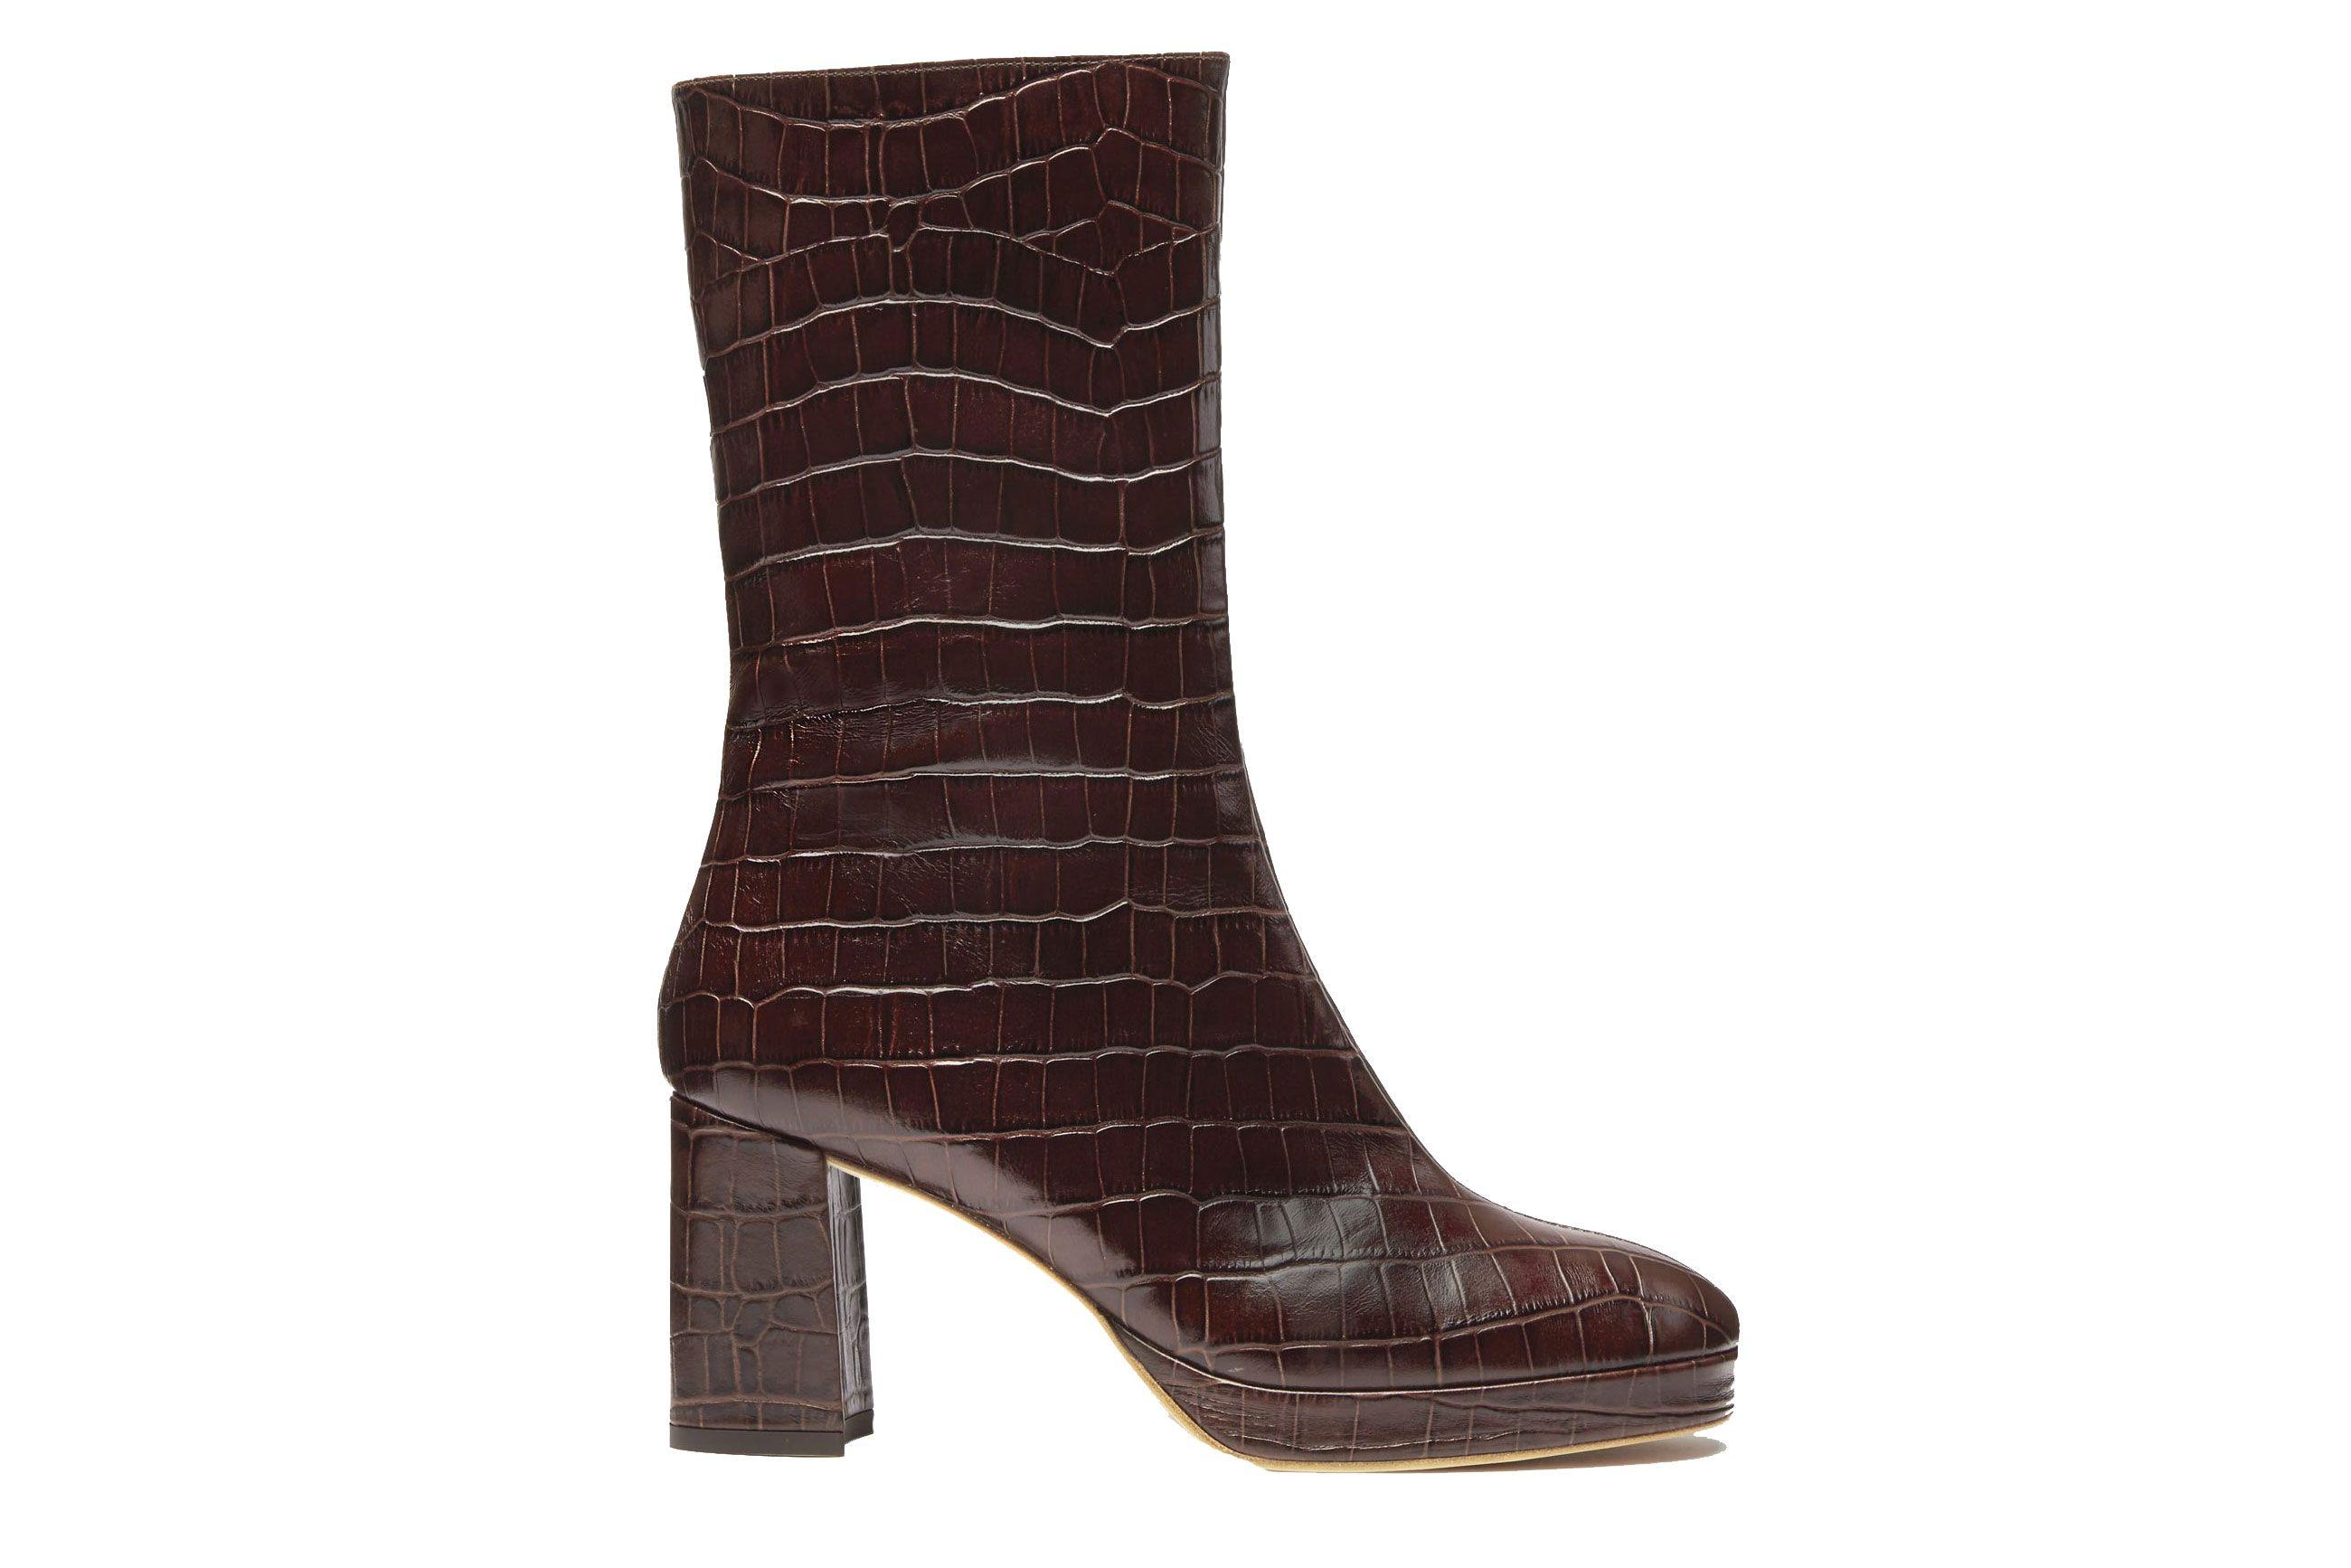 Miista Carlota Ankle Boot